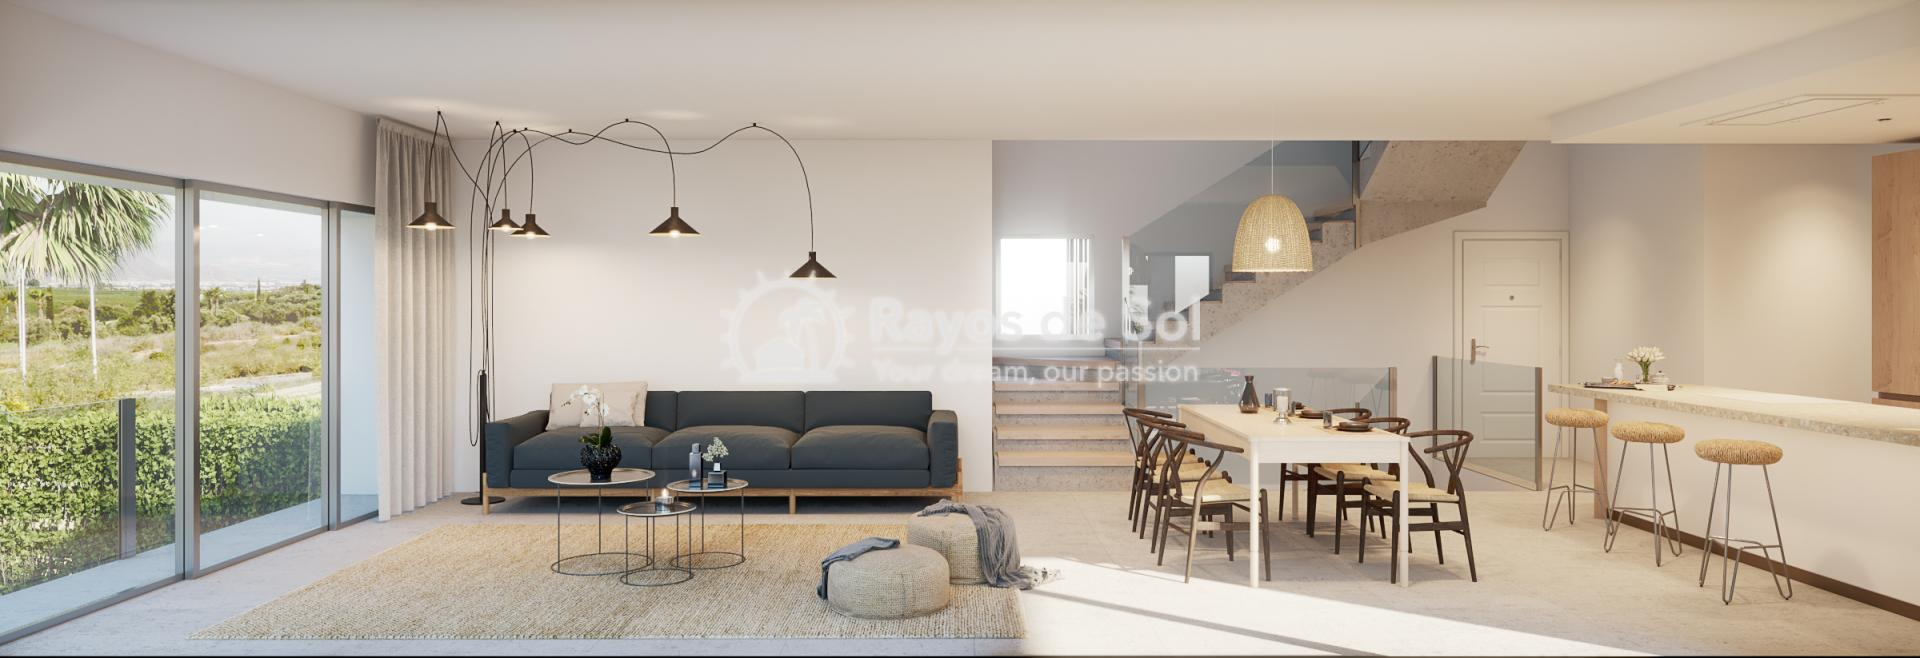 Luxury newbuild villa in La Finca Golf, Algorfa, Costa Blanca (LFPADI) - 9